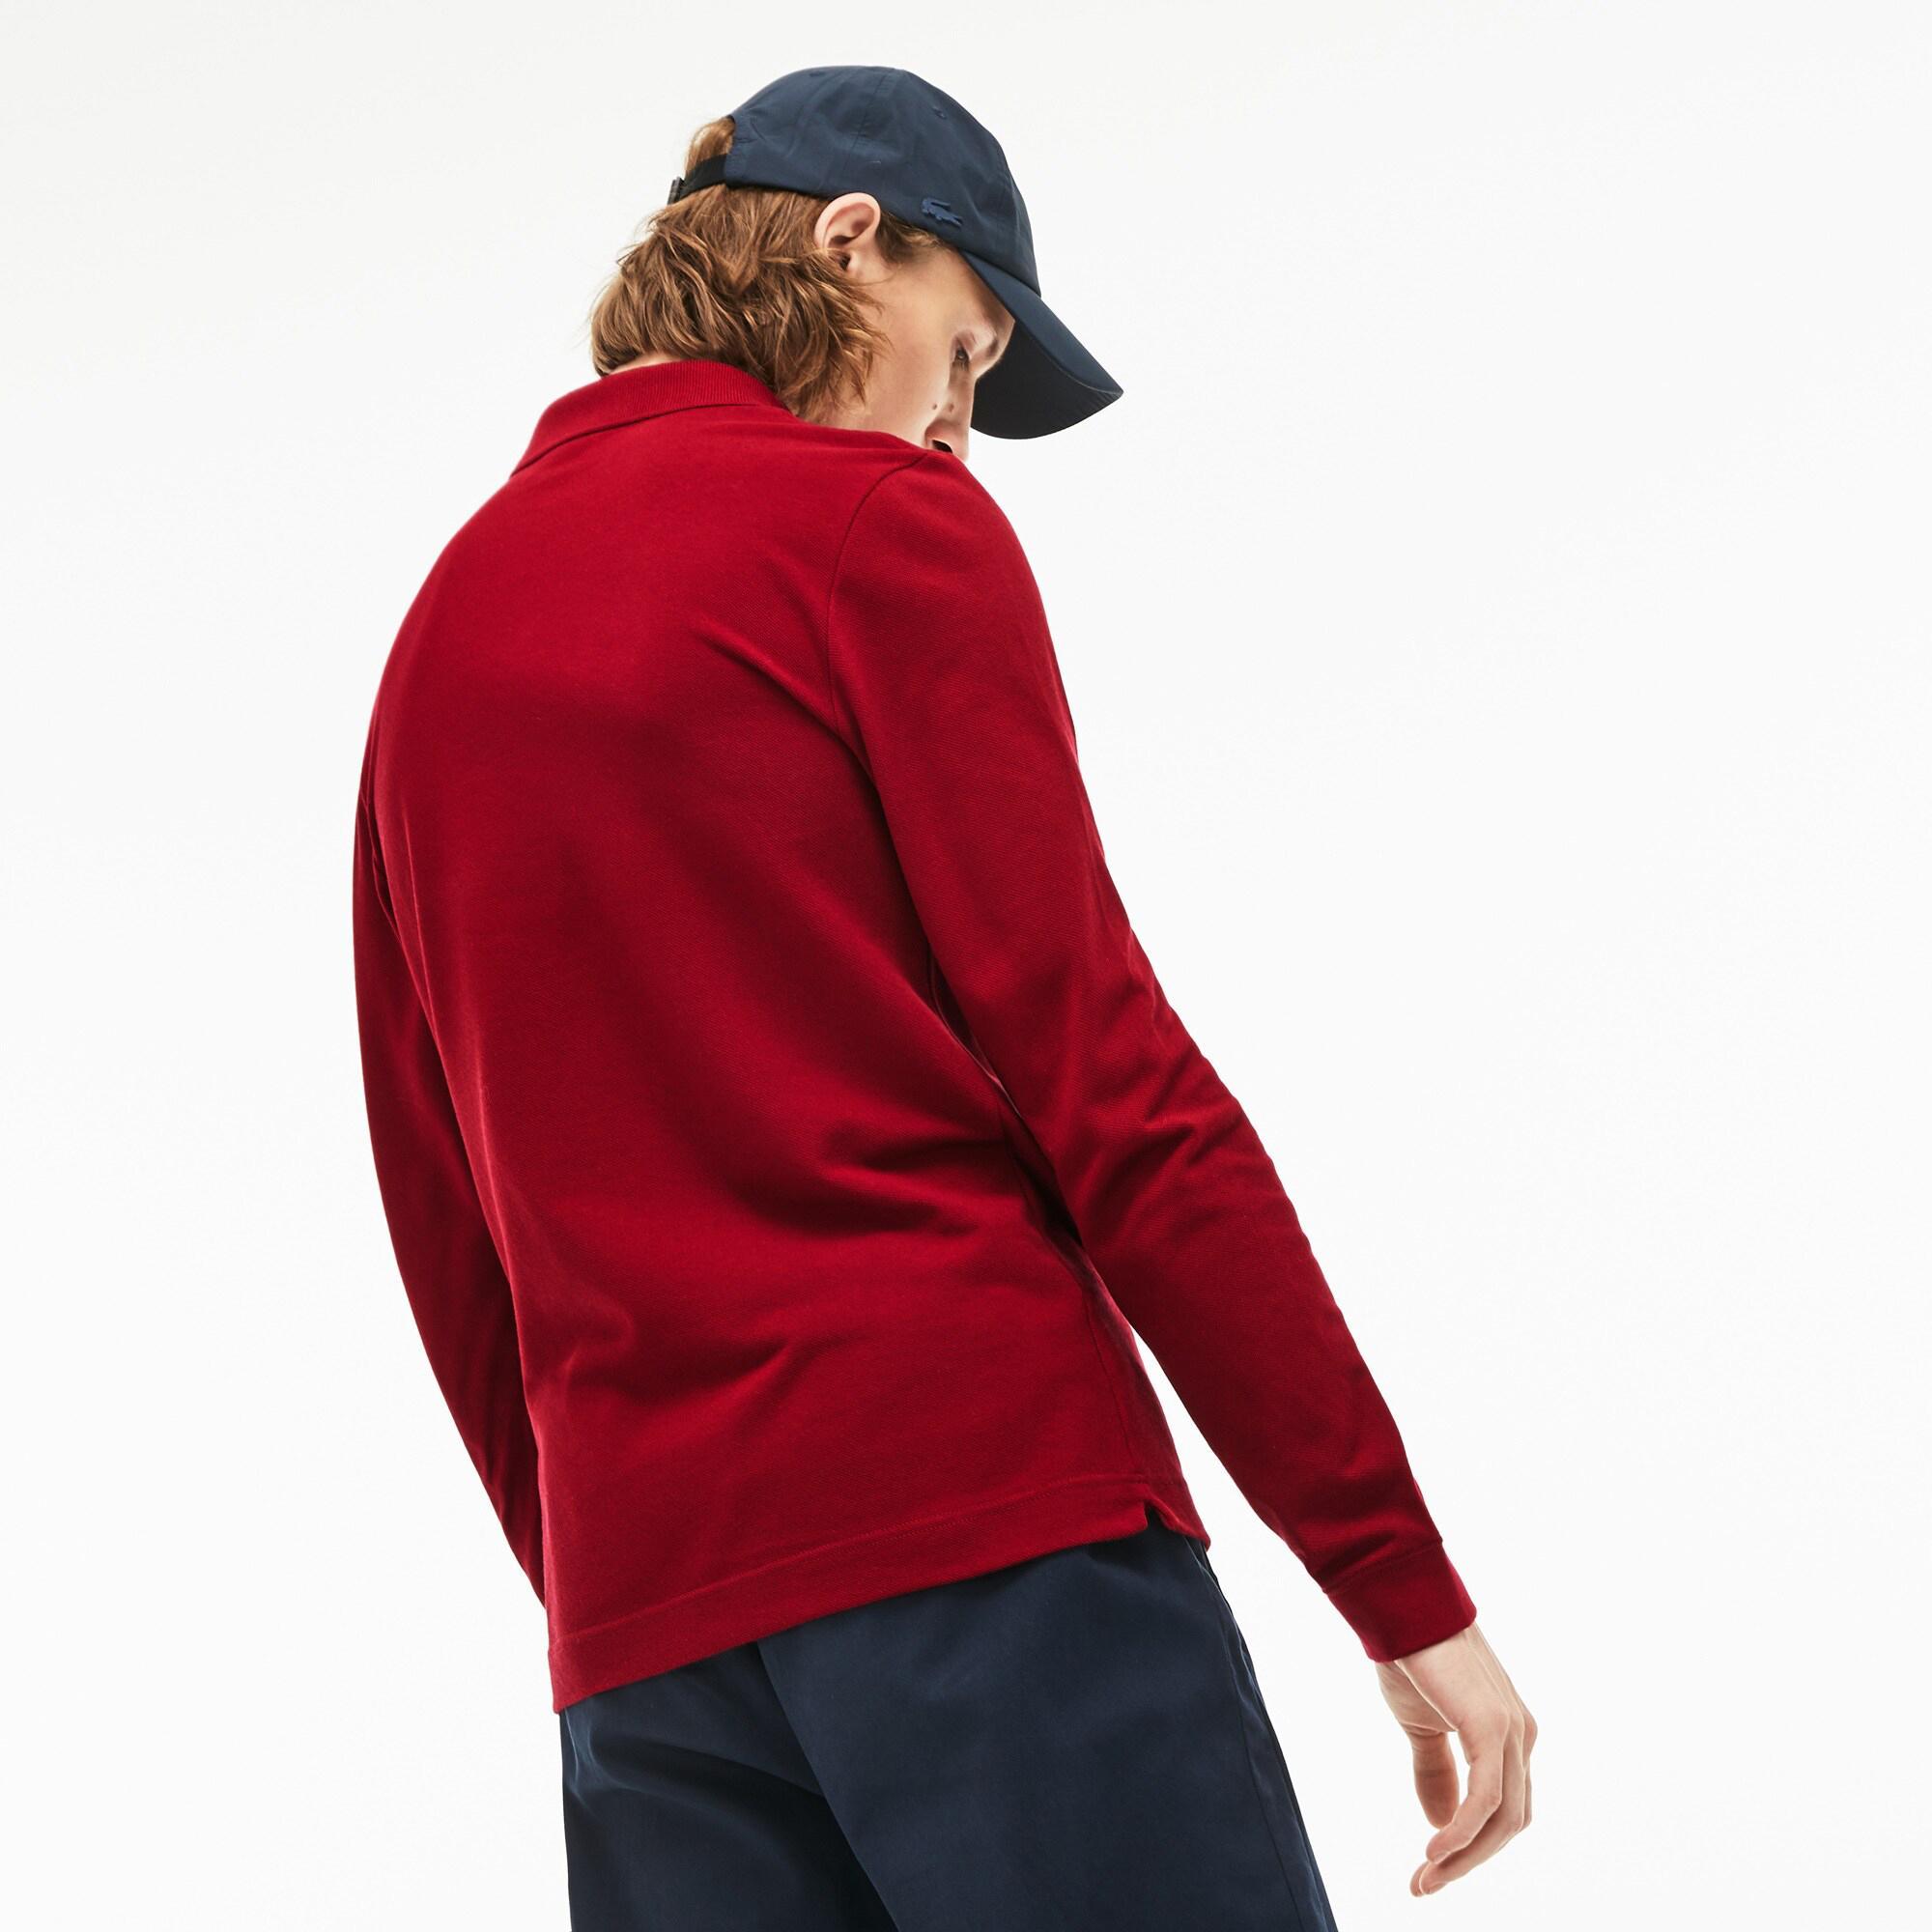 Lacoste Erkek Slim Fit Uzun Kollu Bordo Polo